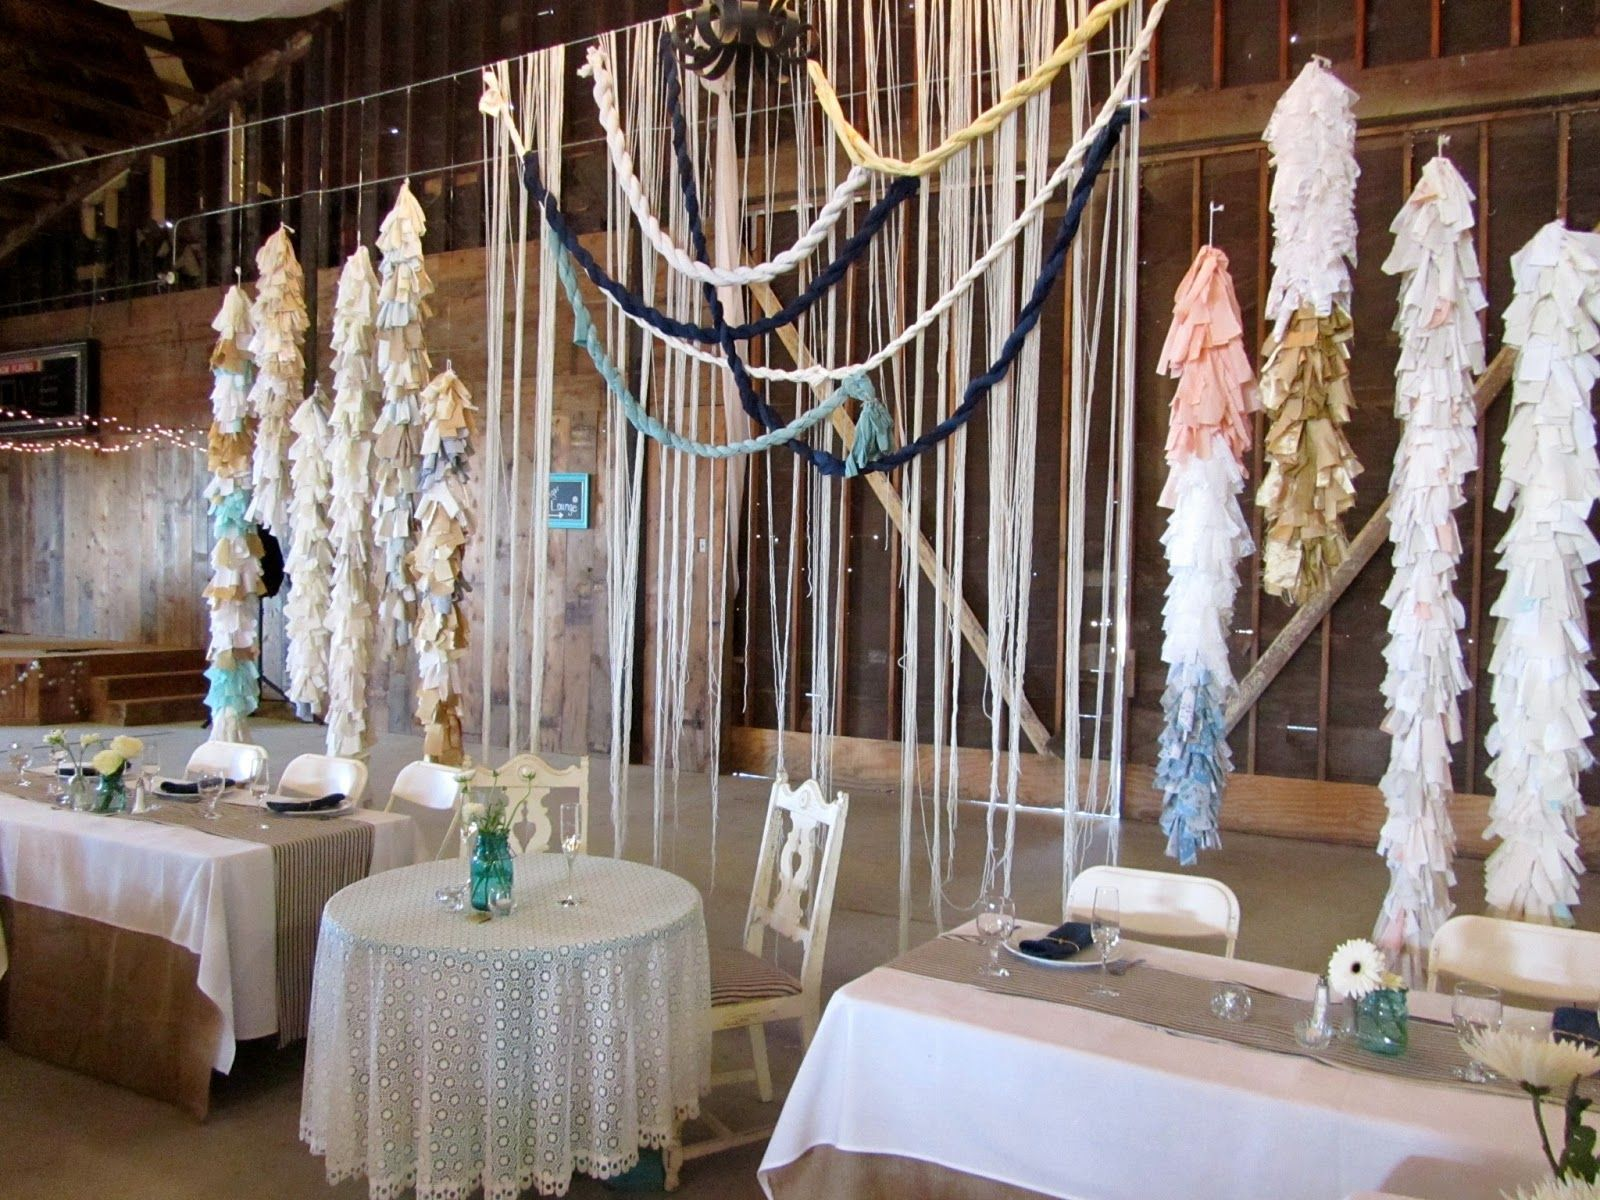 Diy wedding table decorations - Wedding Head Table Decorations Diy Wedding Head Table Decoration Ideas